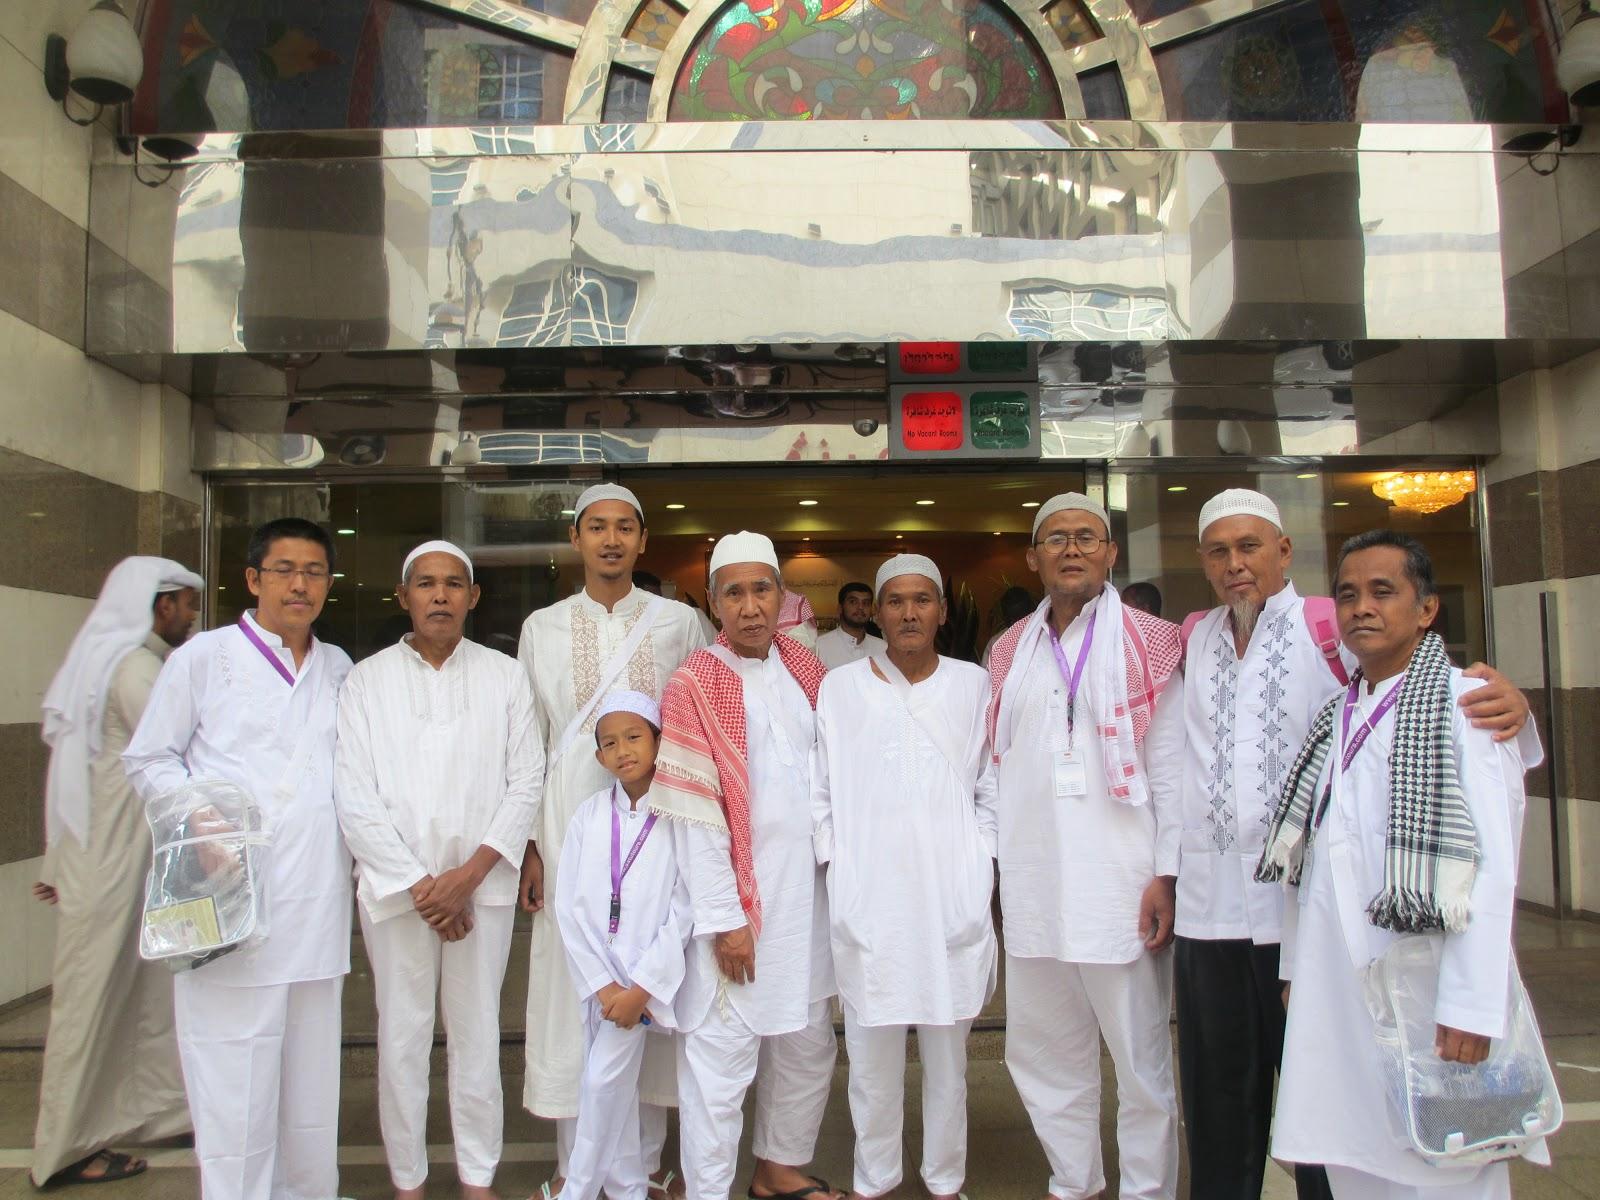 Promo Agen Umroh Jakarta Nyaman, Bagus, dan Terpercaya